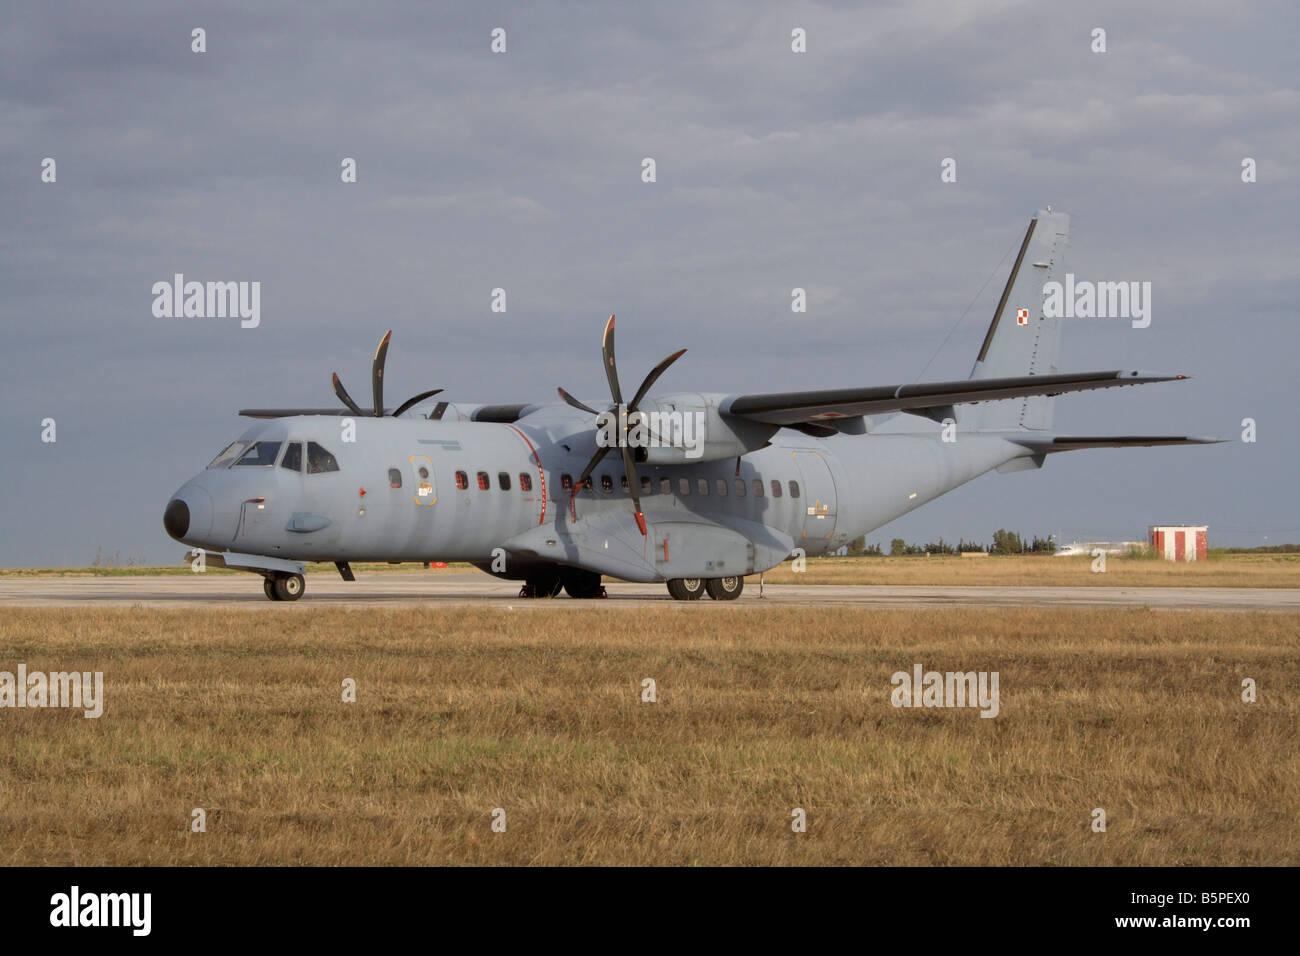 Polish Air Force CASA C-295M light military cargo plane - Stock Image